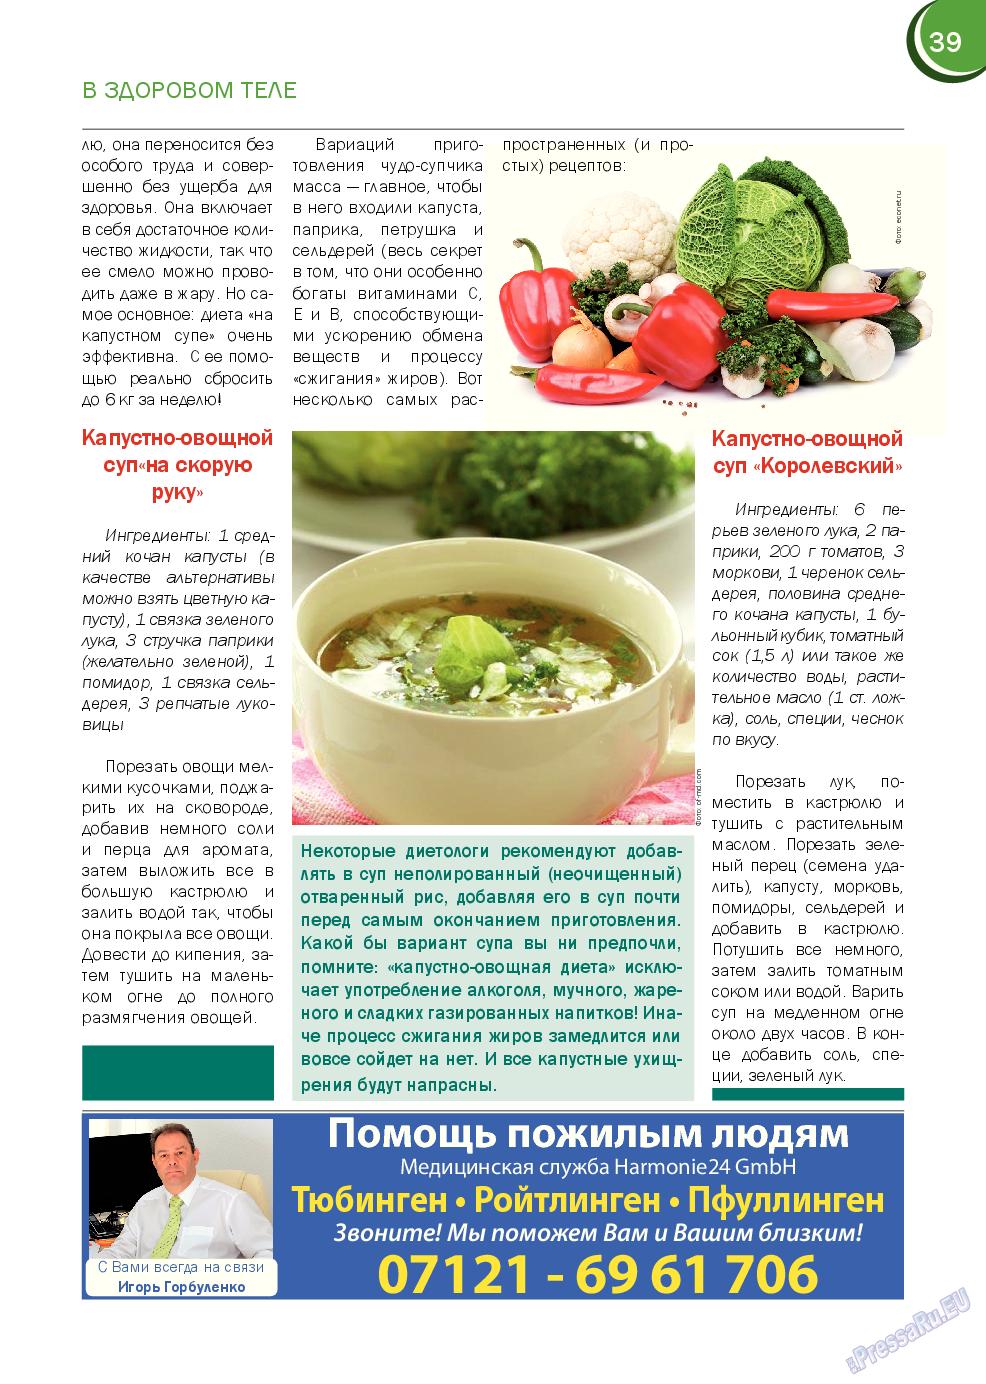 Русский Баден-Вюртемберг (журнал). 2014 год, номер 43, стр. 39